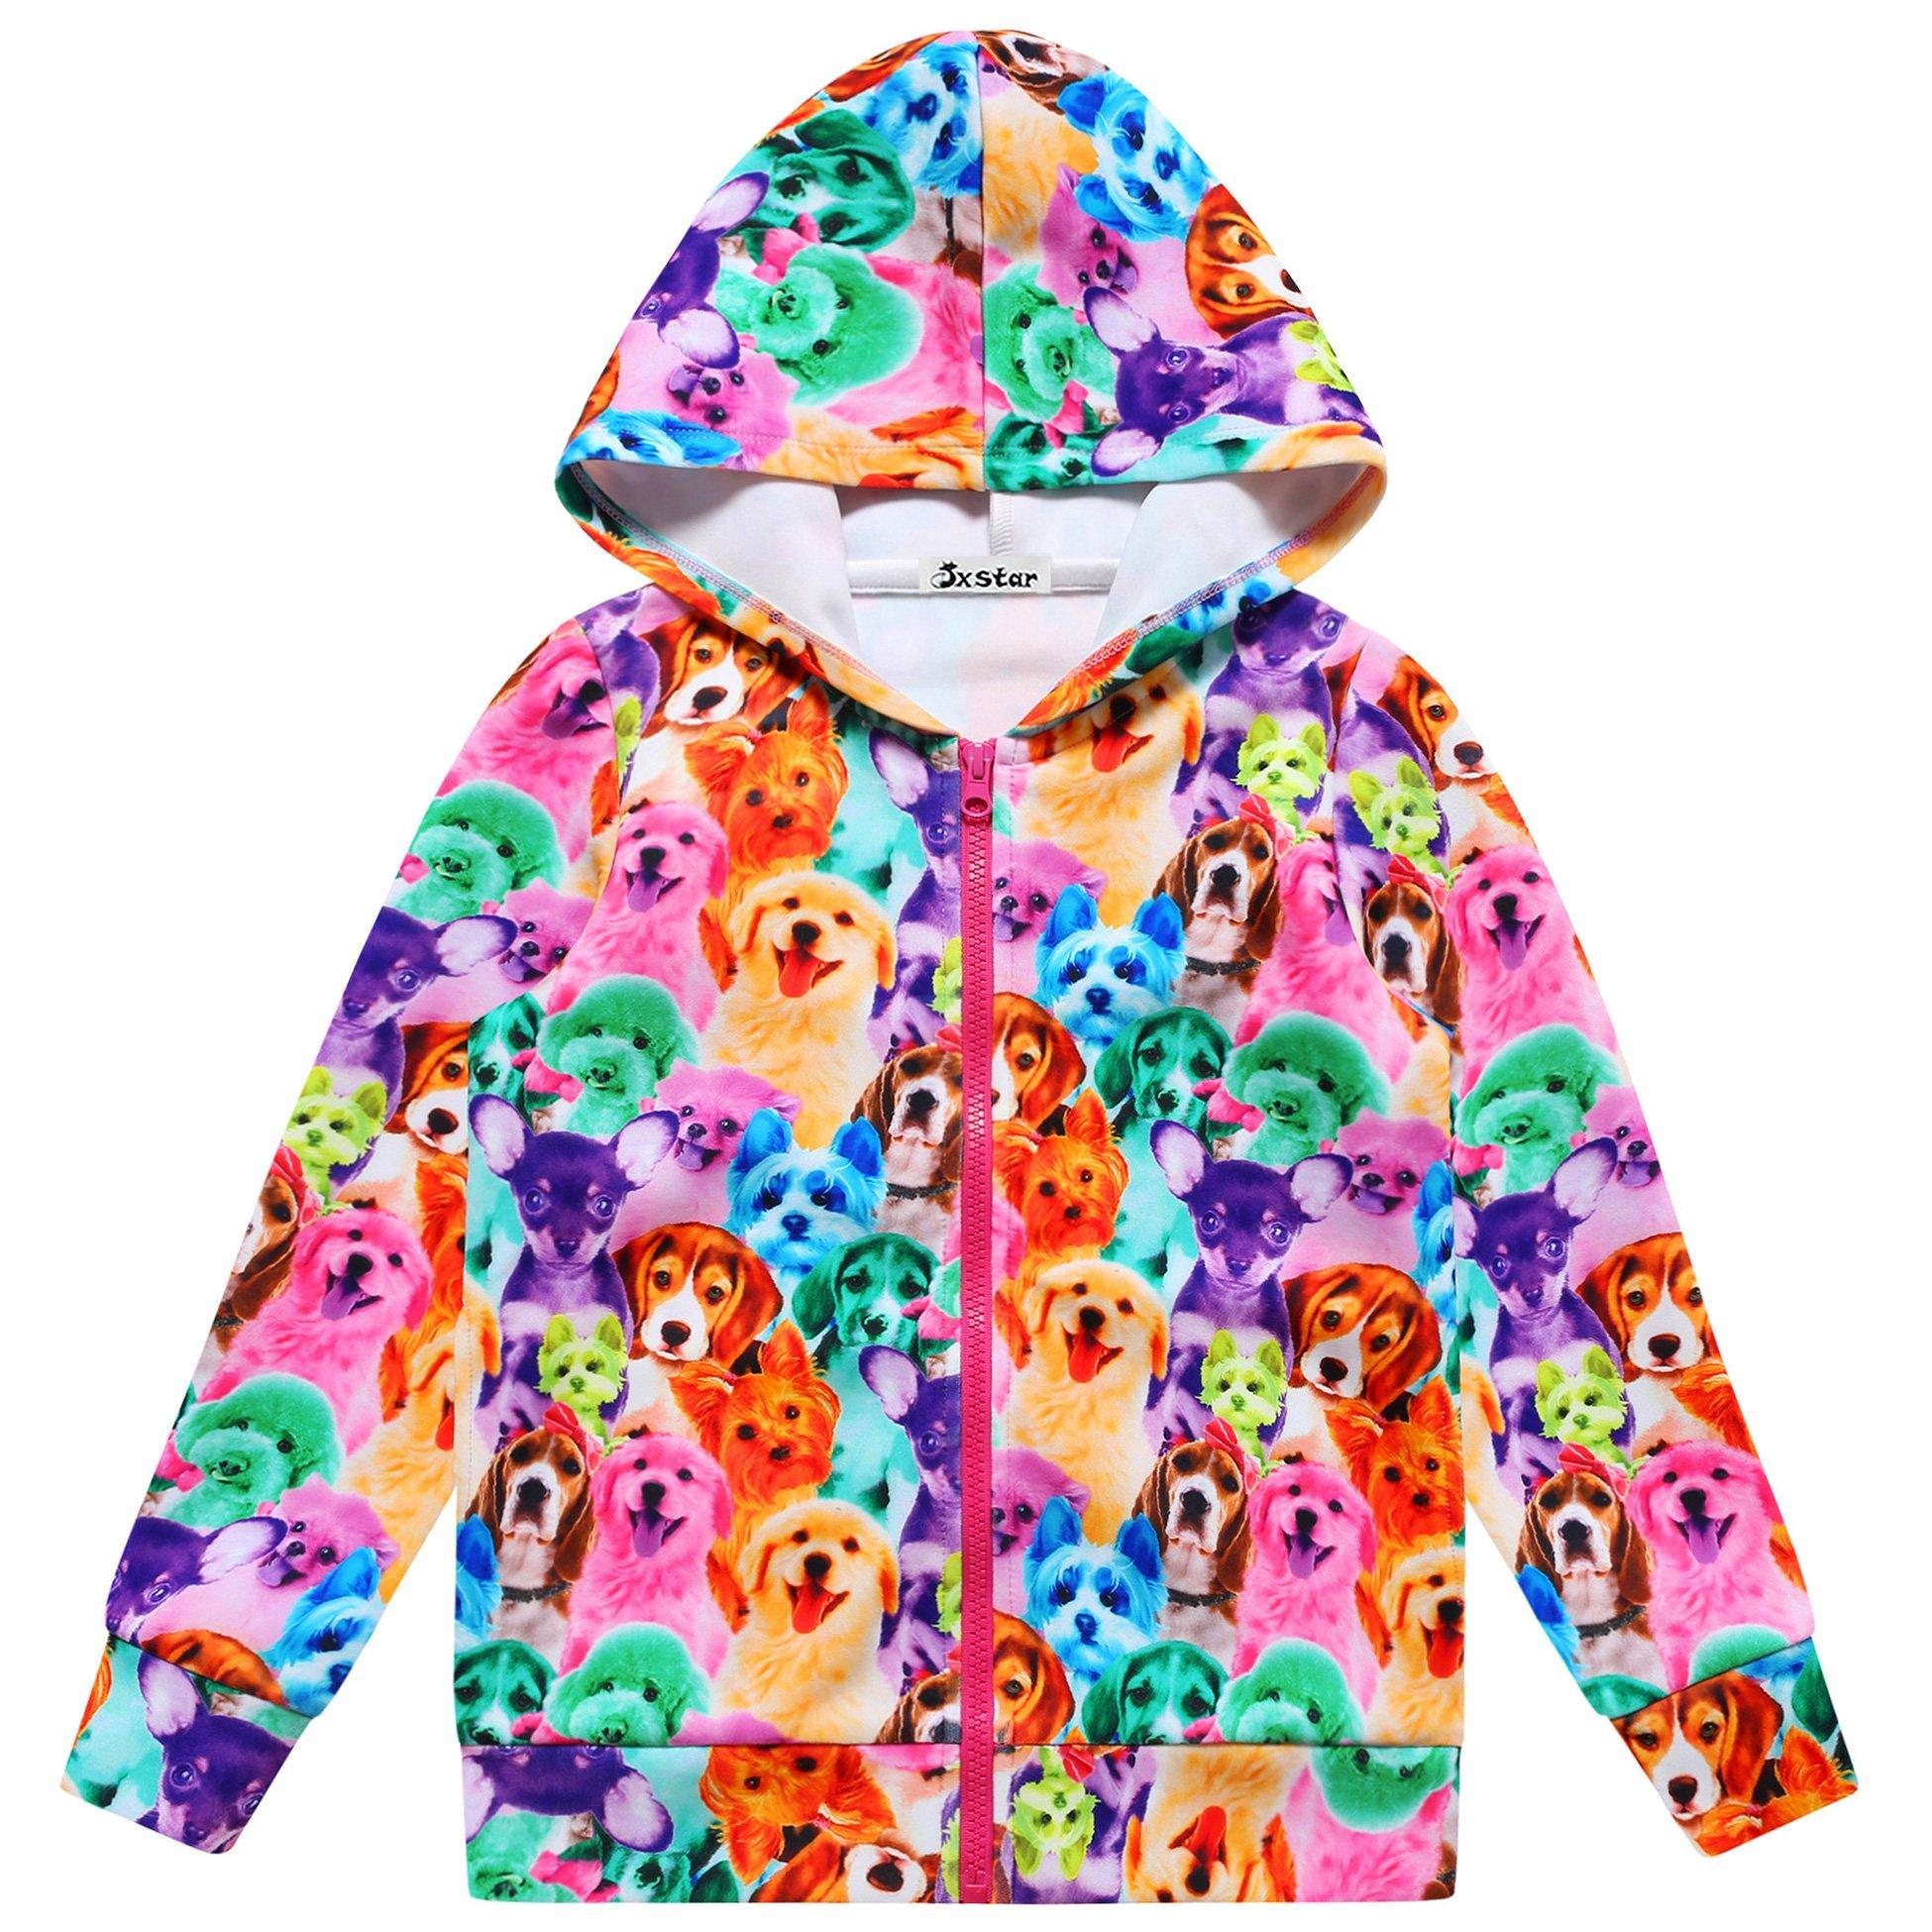 Jxstar Girl Bomber Jacket Rainbow Dog Print Cartoon Long Sleeve Full Zip Pocket